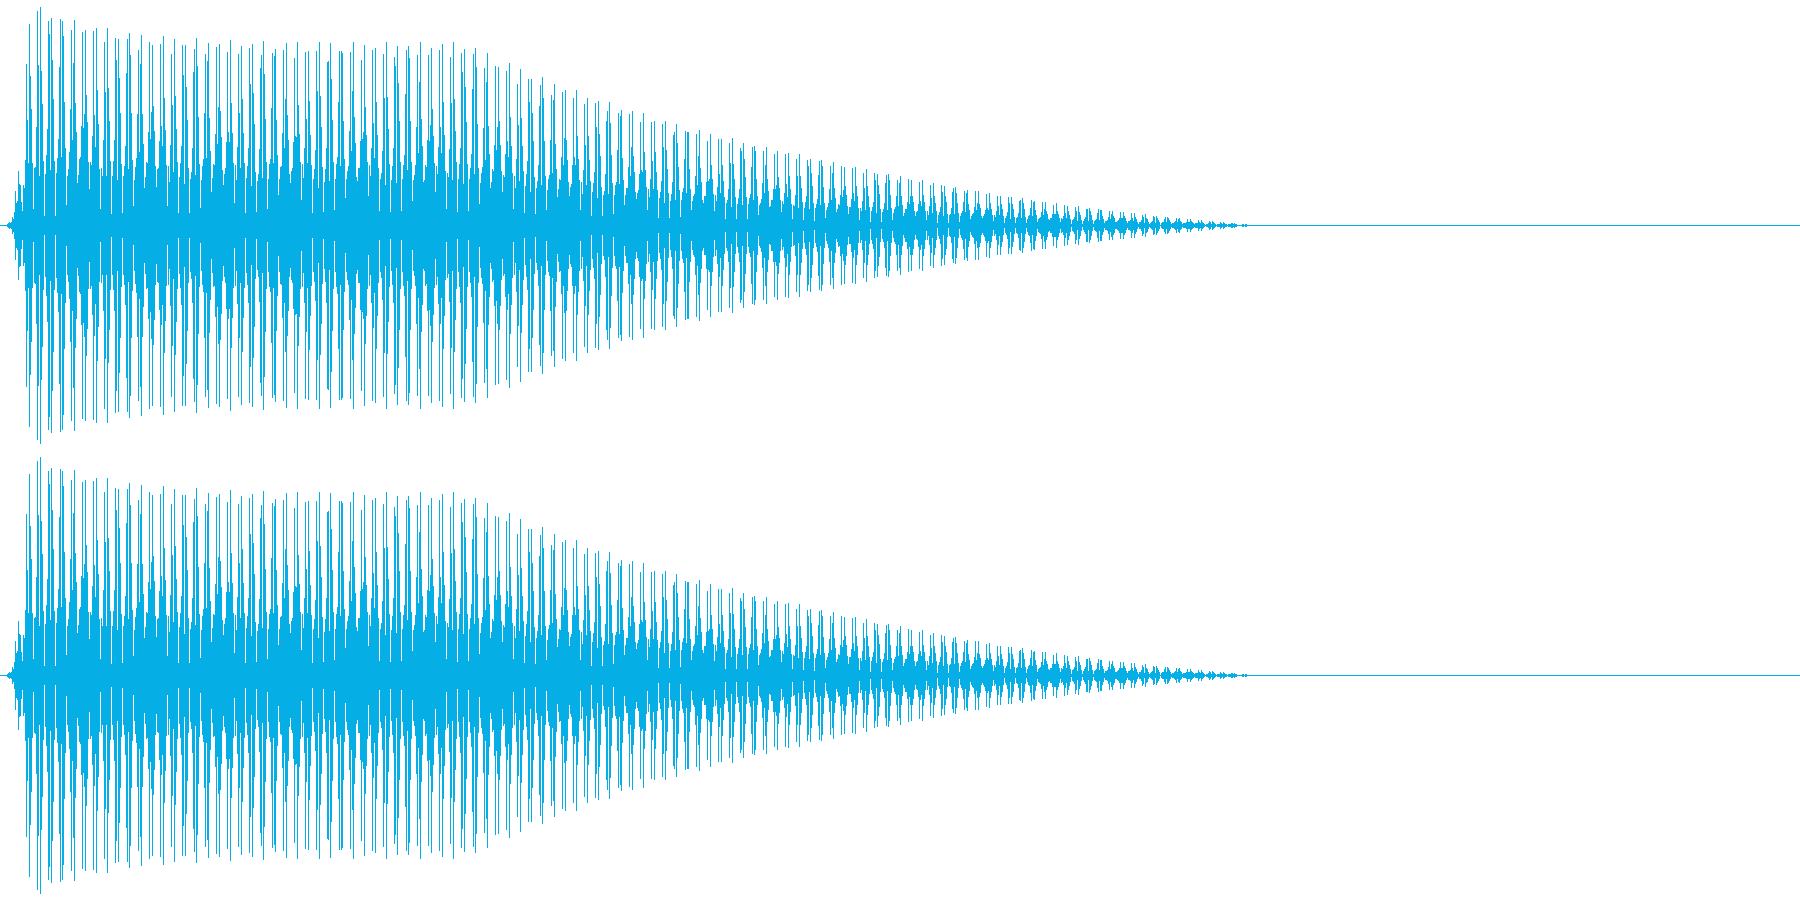 OctaveCom アプリ用タッチ音12の再生済みの波形